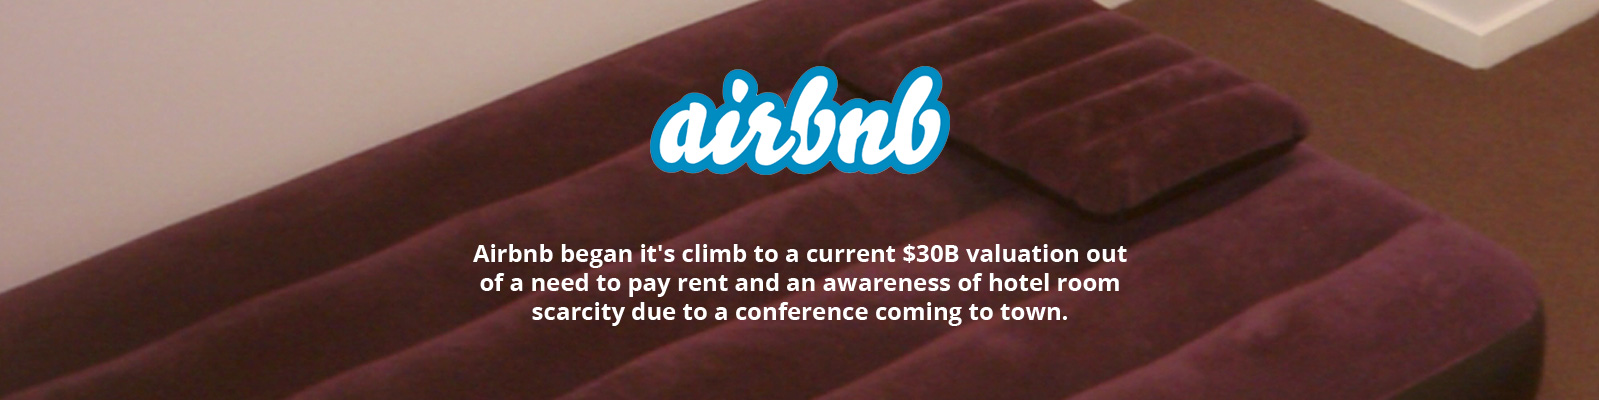 blog-vision-venn-airbnb